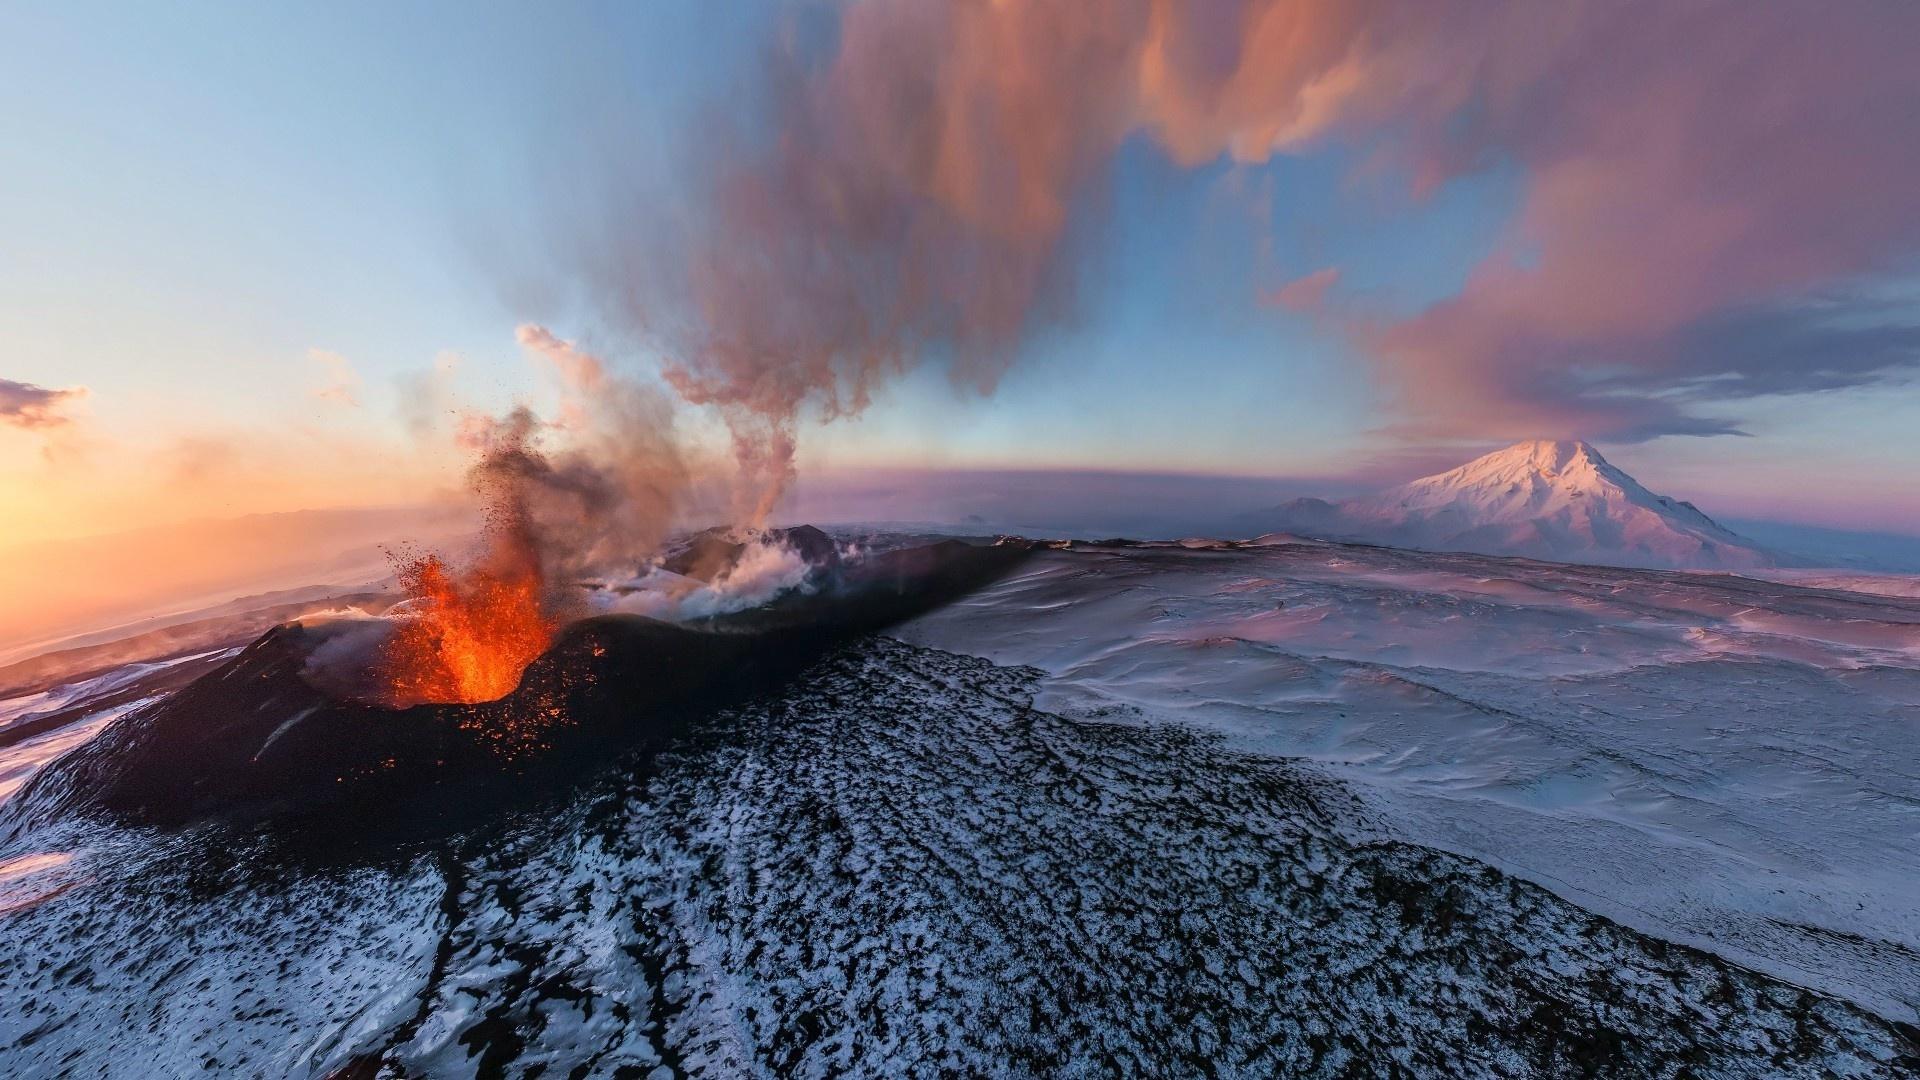 Volcano Eruption Wallpaper